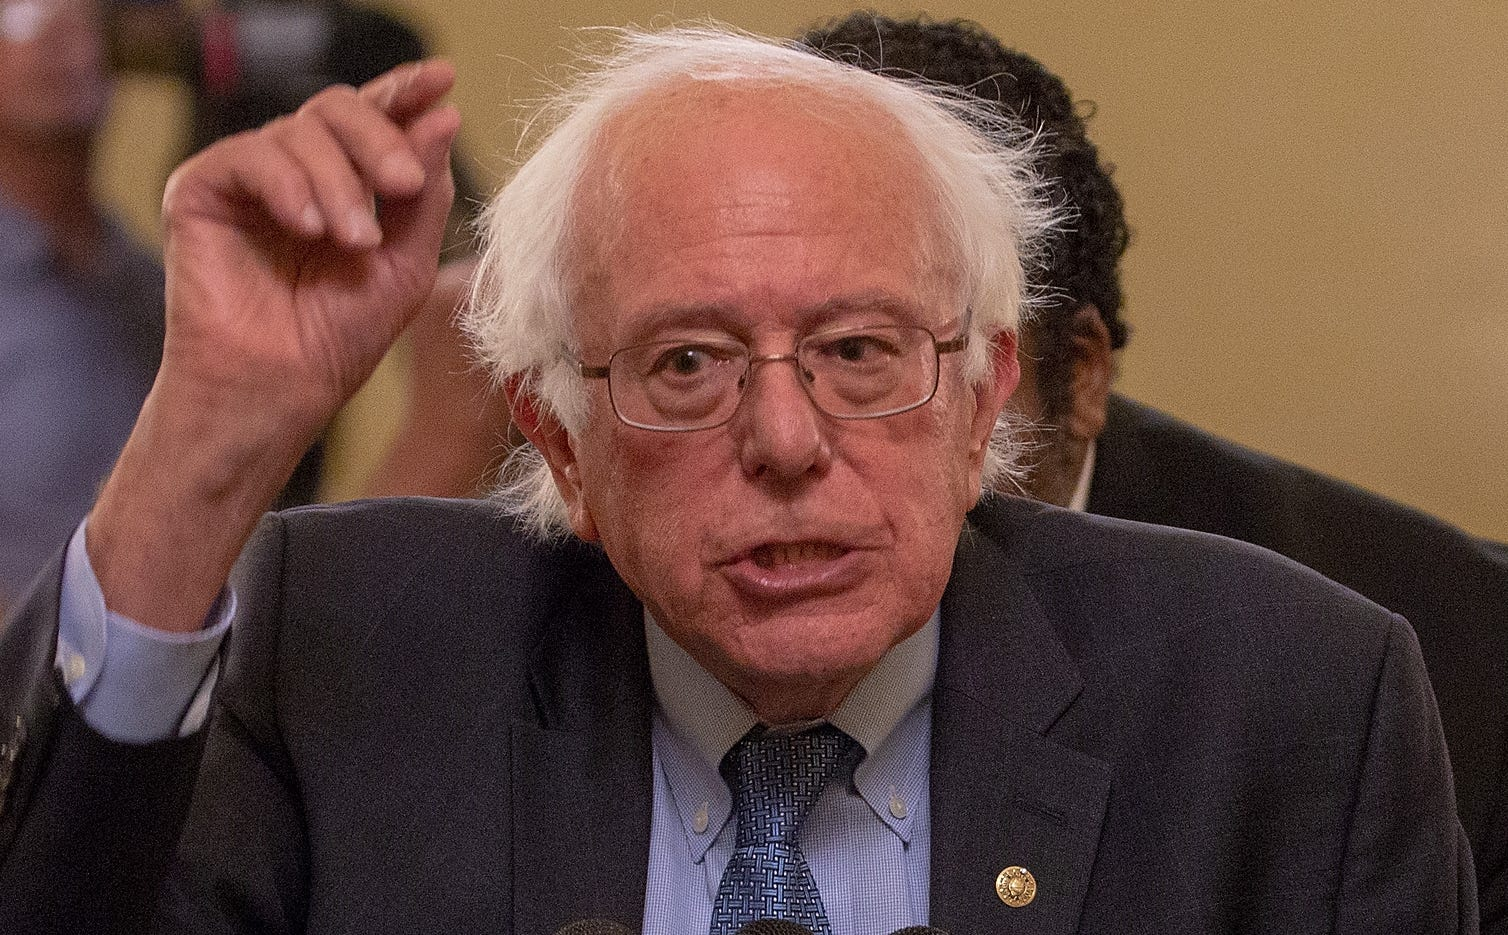 Sen. Bernie Sanders, I-Vt., attends a press conference on July 24, 2018 in Washington.